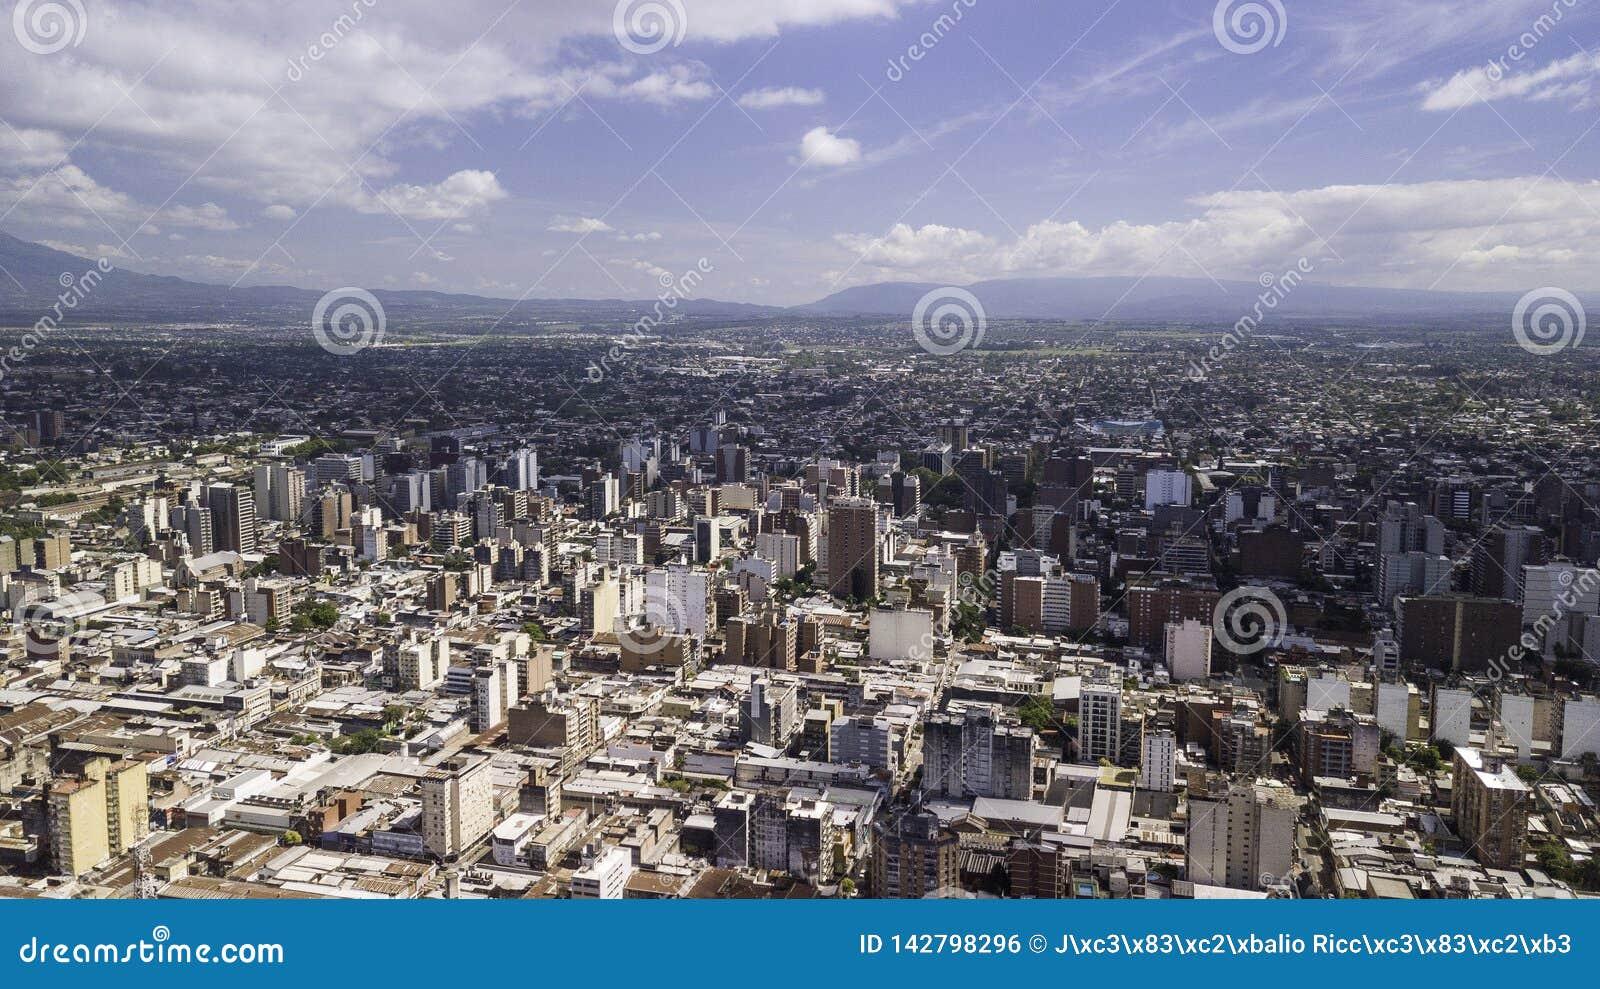 San Miguel DE Tucumà ¡ n/Tucumà ¡ n/Argentina - 01 01 19: Satellietbeeld van de stad van San Miguel DE Tucumà ¡ n, Argentinië